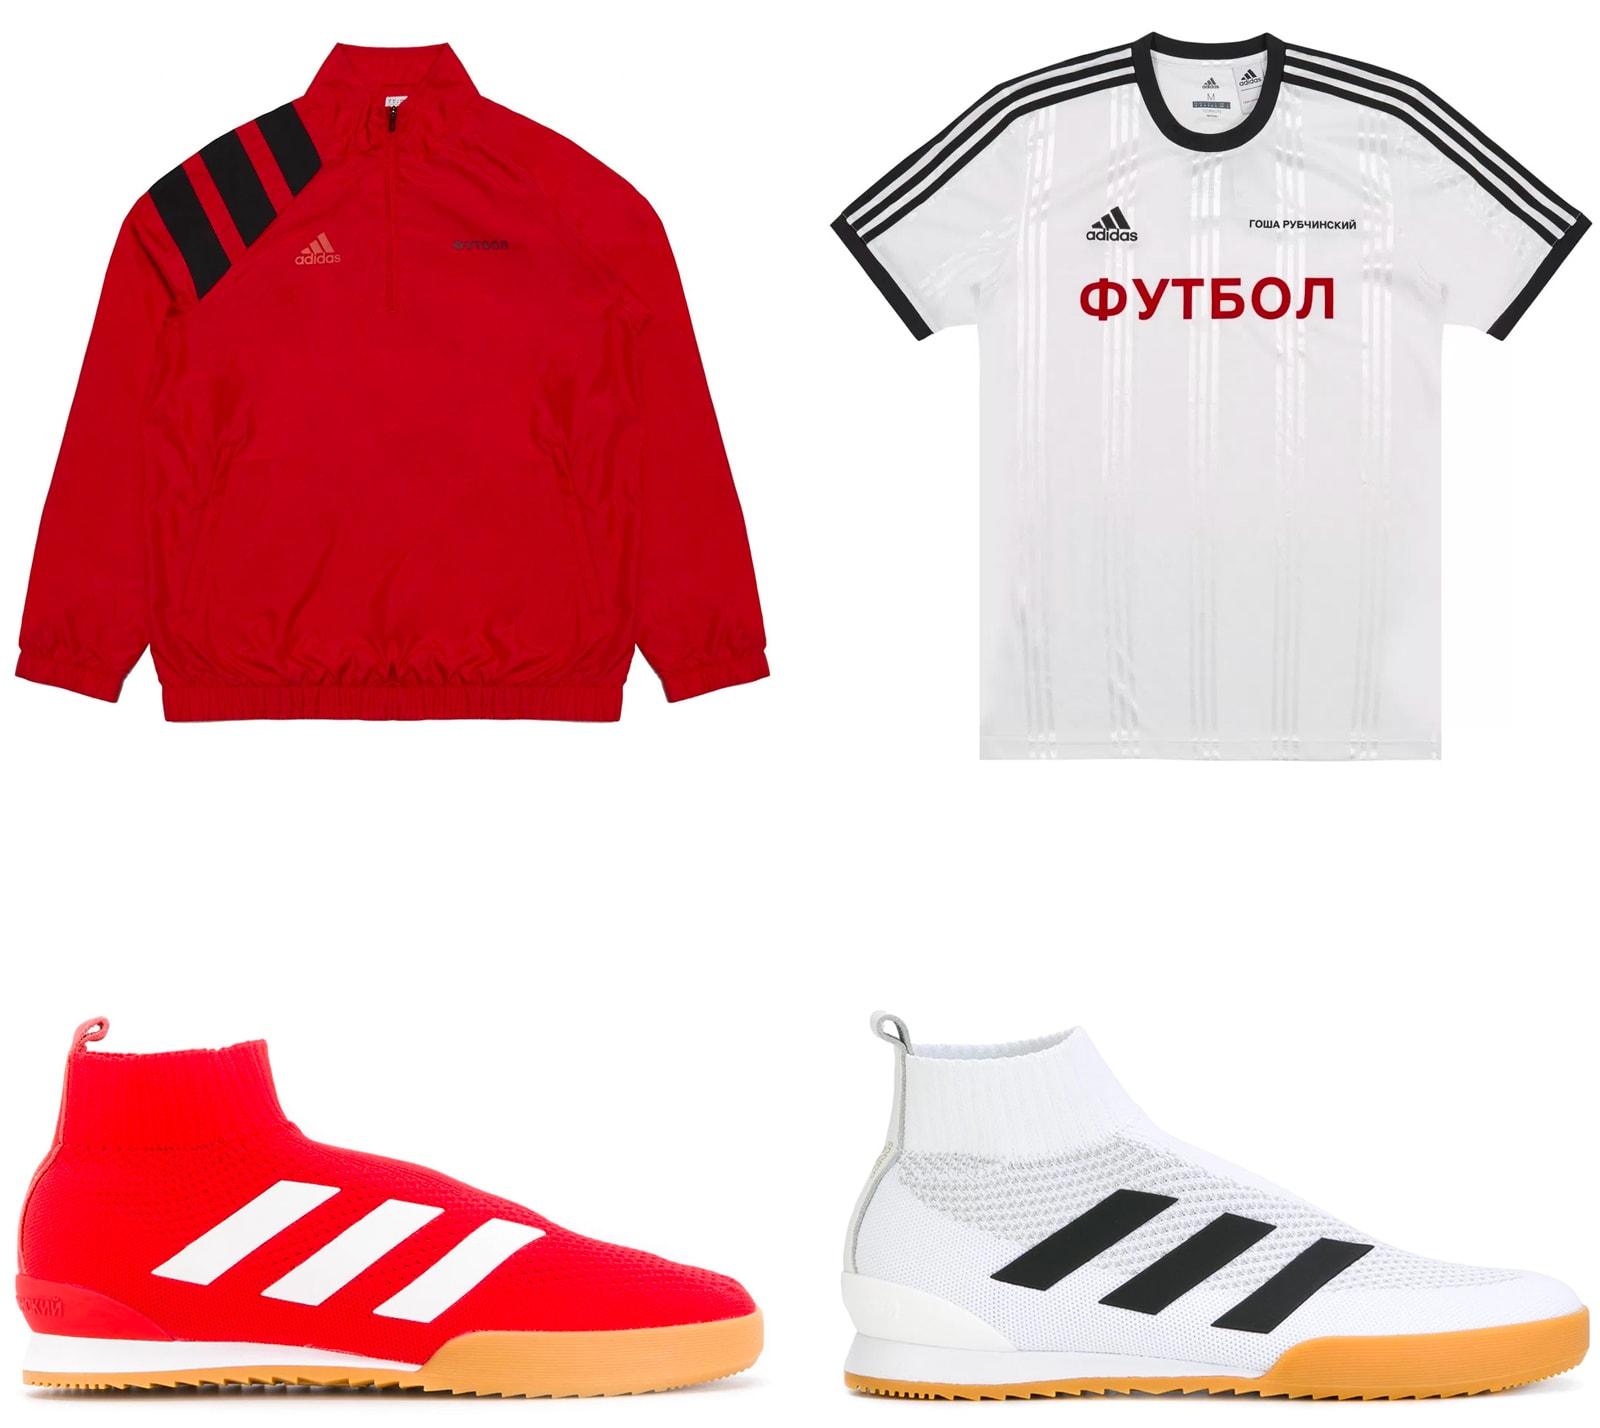 https://hypebeast.com/image/2017/12/Gosha-Rubchinskiy-x-adidas-Football.jpg